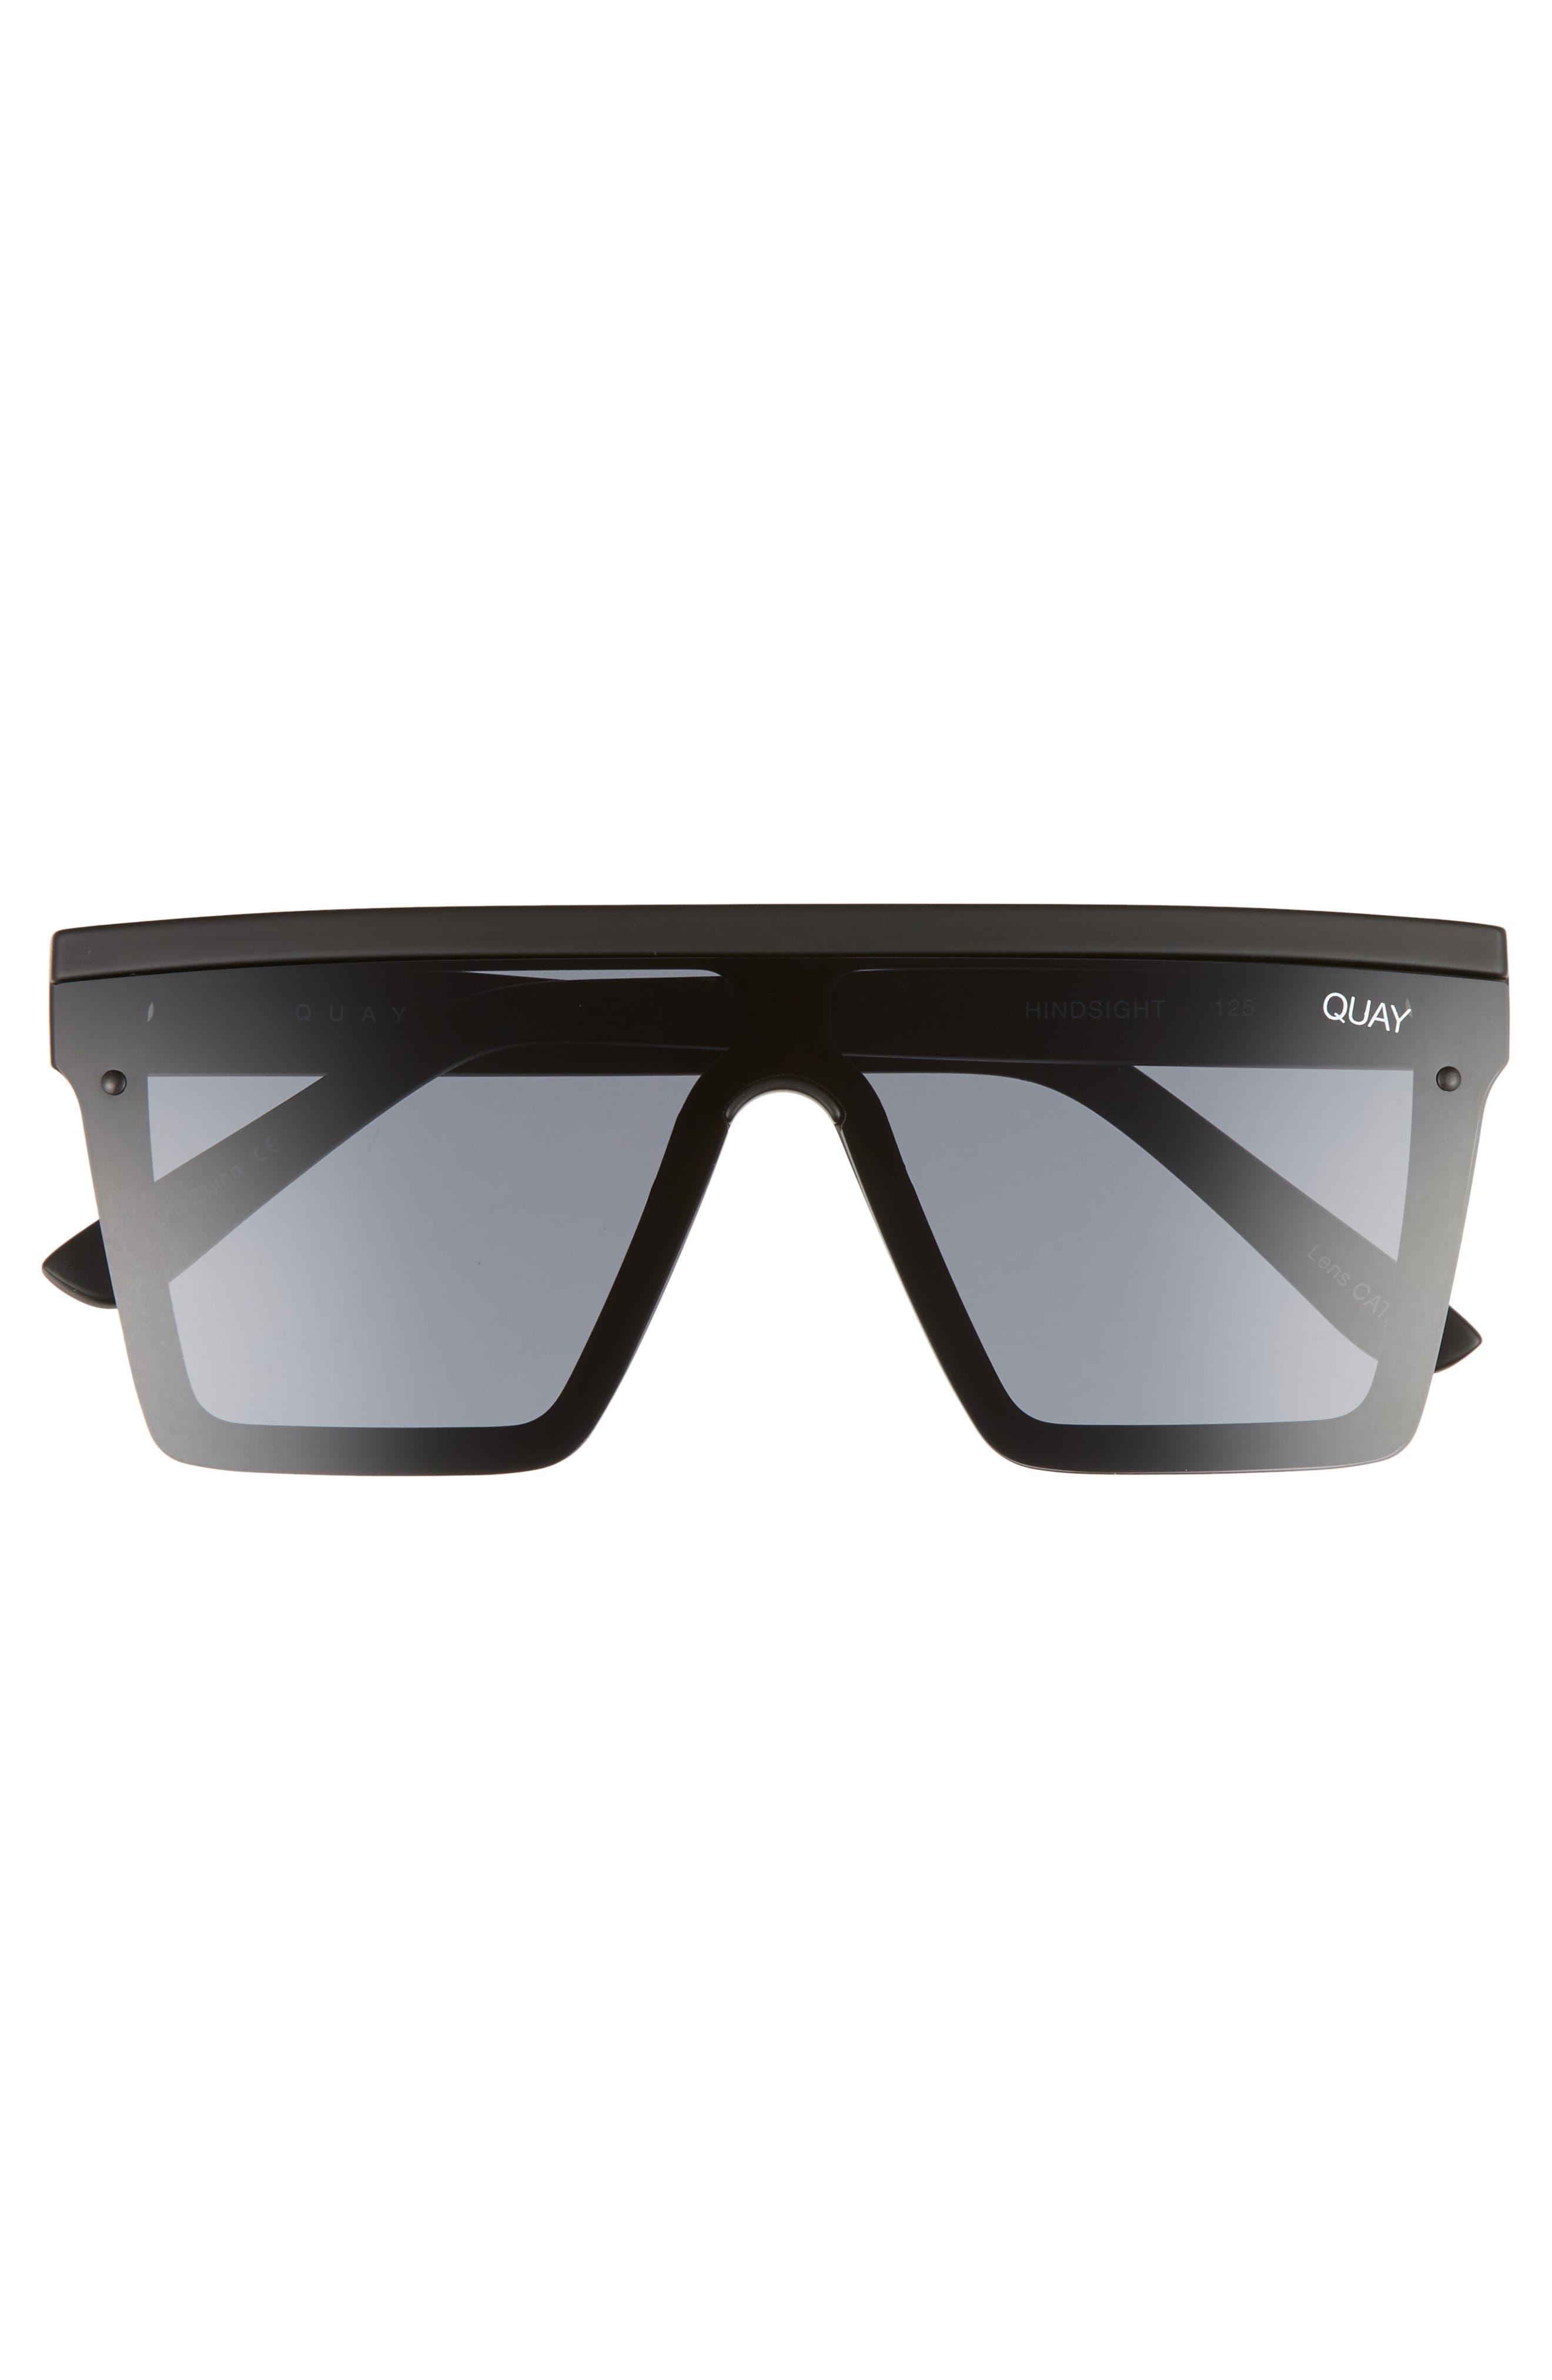 Hindsight 150mm Shield Sunglasses,                             Alternate thumbnail 3, color,                             BLACK/ SMOKE